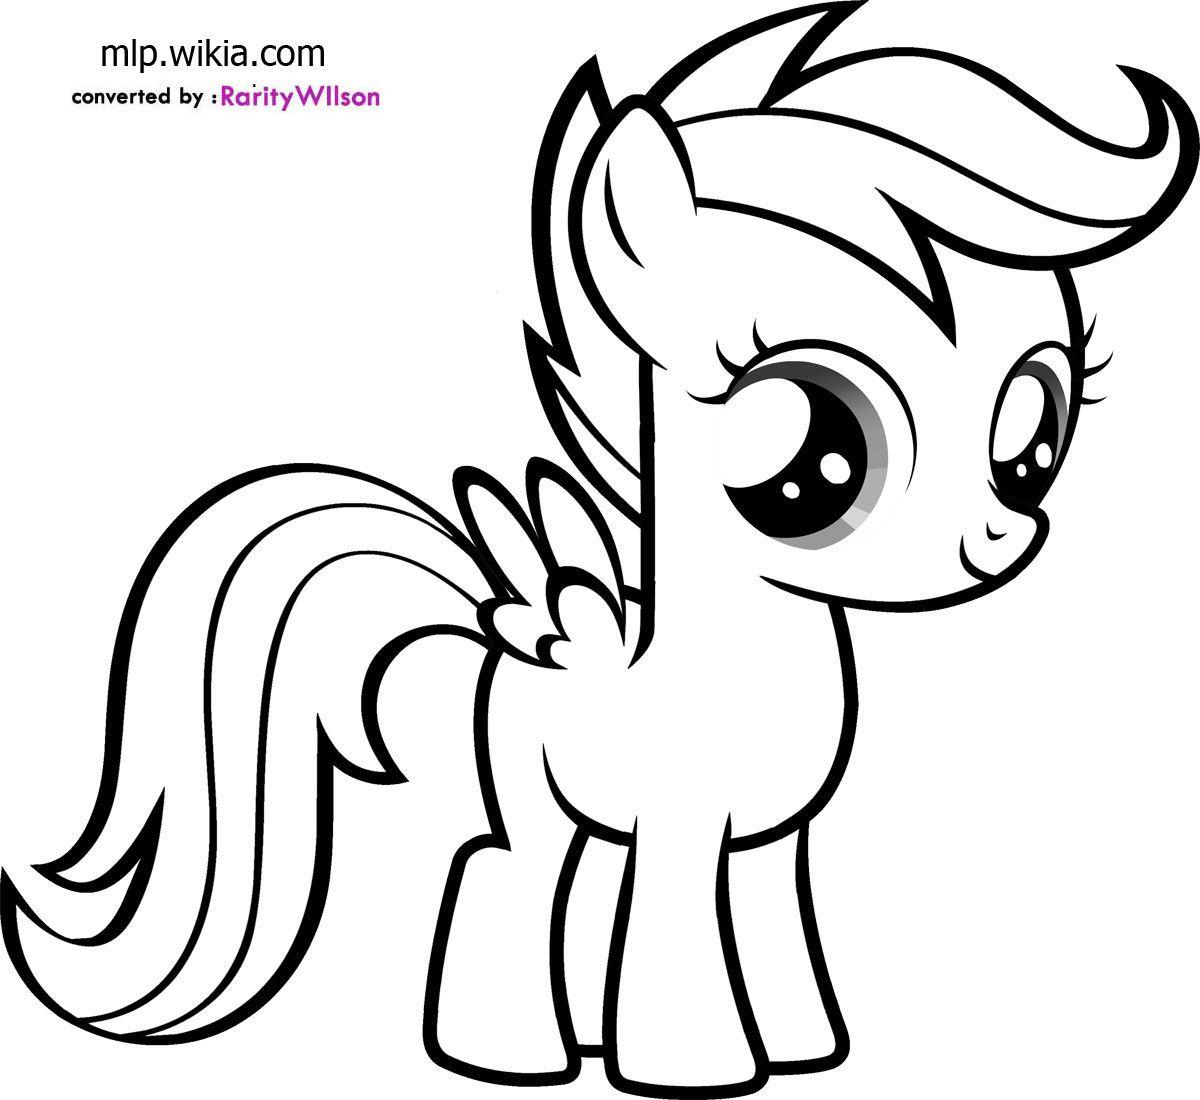 My Little Pony Coloring Pages Bing Images Kleurplaten Illustraties Doodles